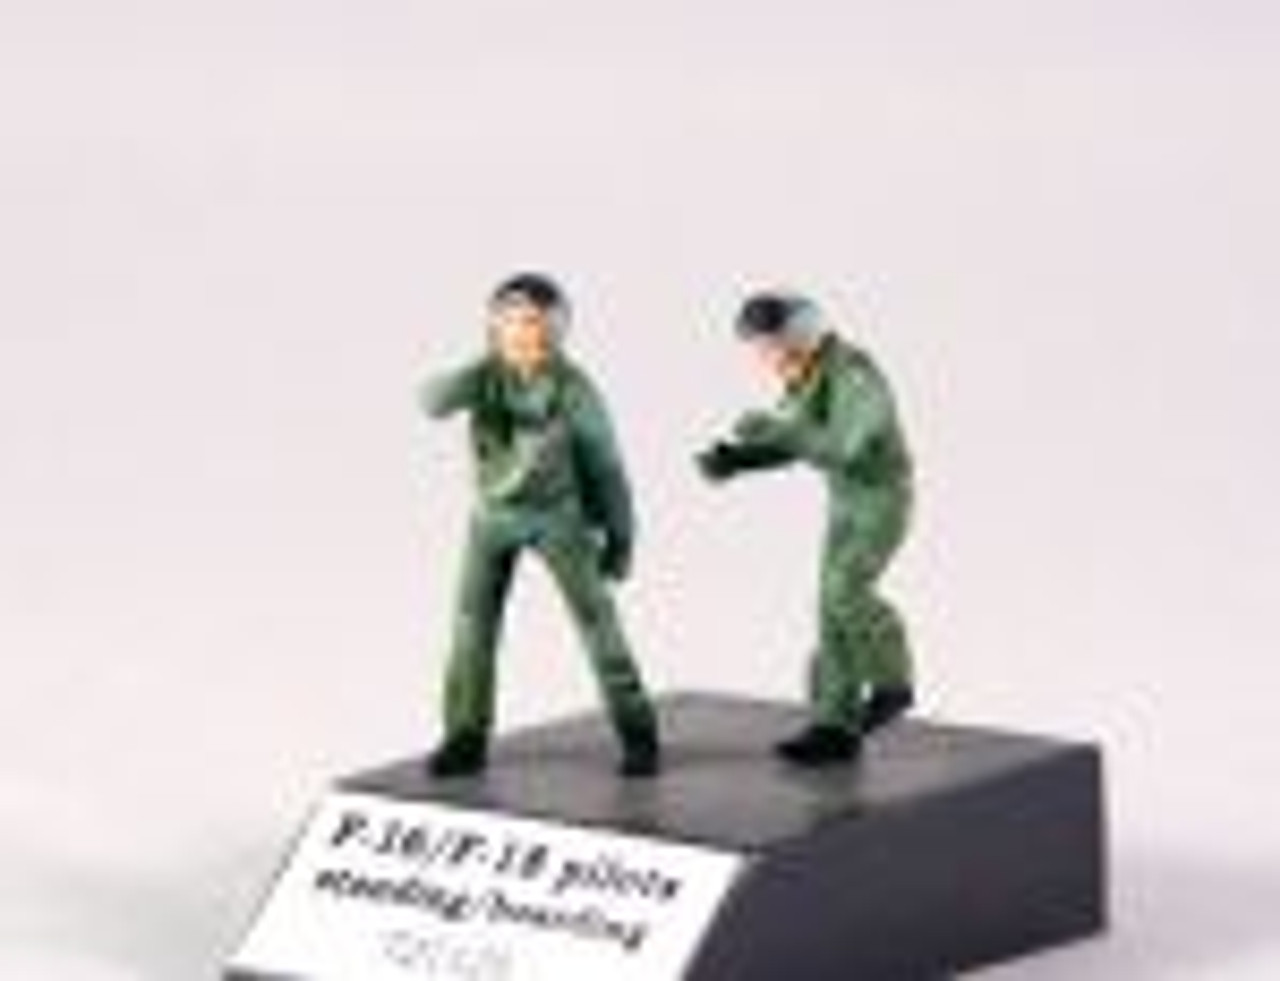 PJ Productions 2x F-16/F-18 pilots standing/boarding Figures 1:72